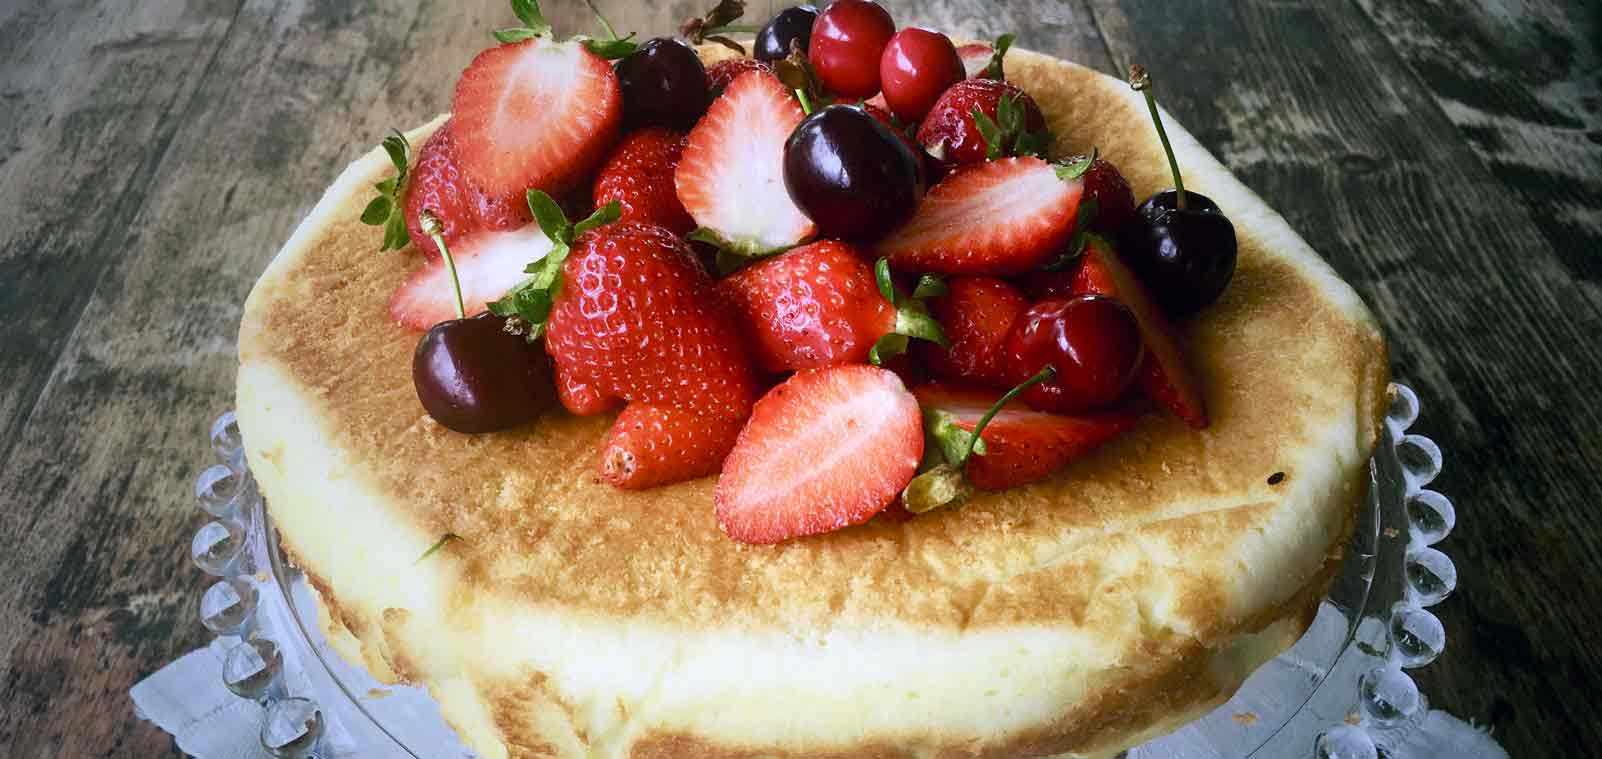 ALMOND LEMON RICOTTA CAKE